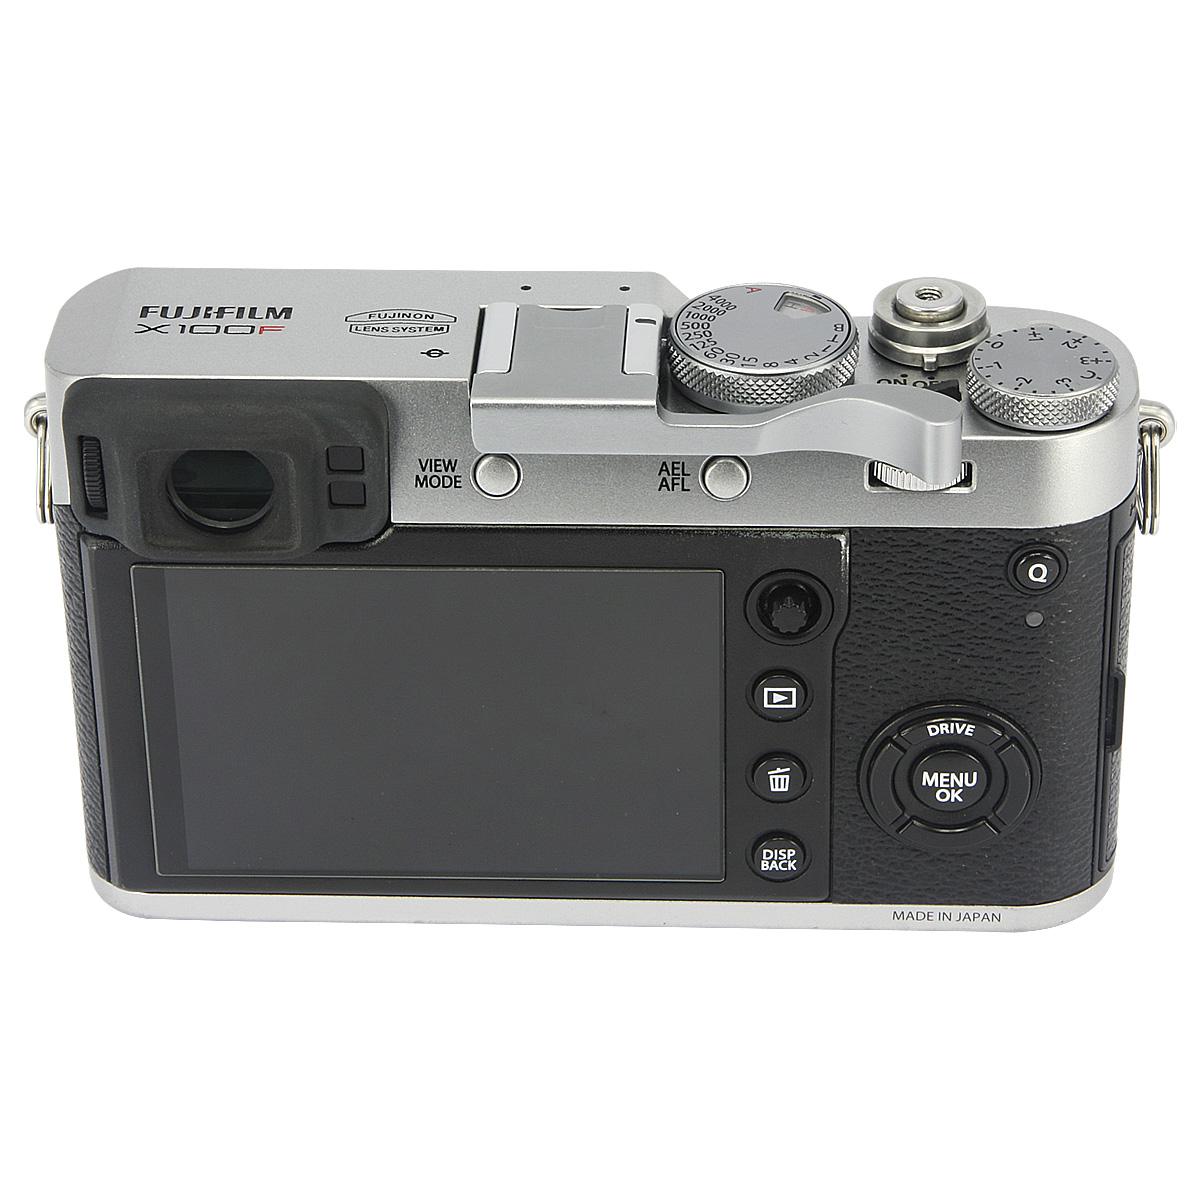 Haoge THB-XT4S Metal Hot Shoe Thumb Up Rest Hand Grip for Fujifilm Fuji X-T1 X-T2 X-T3 X-T4 XT1 XT2 XT3 XT4 Camera Silver